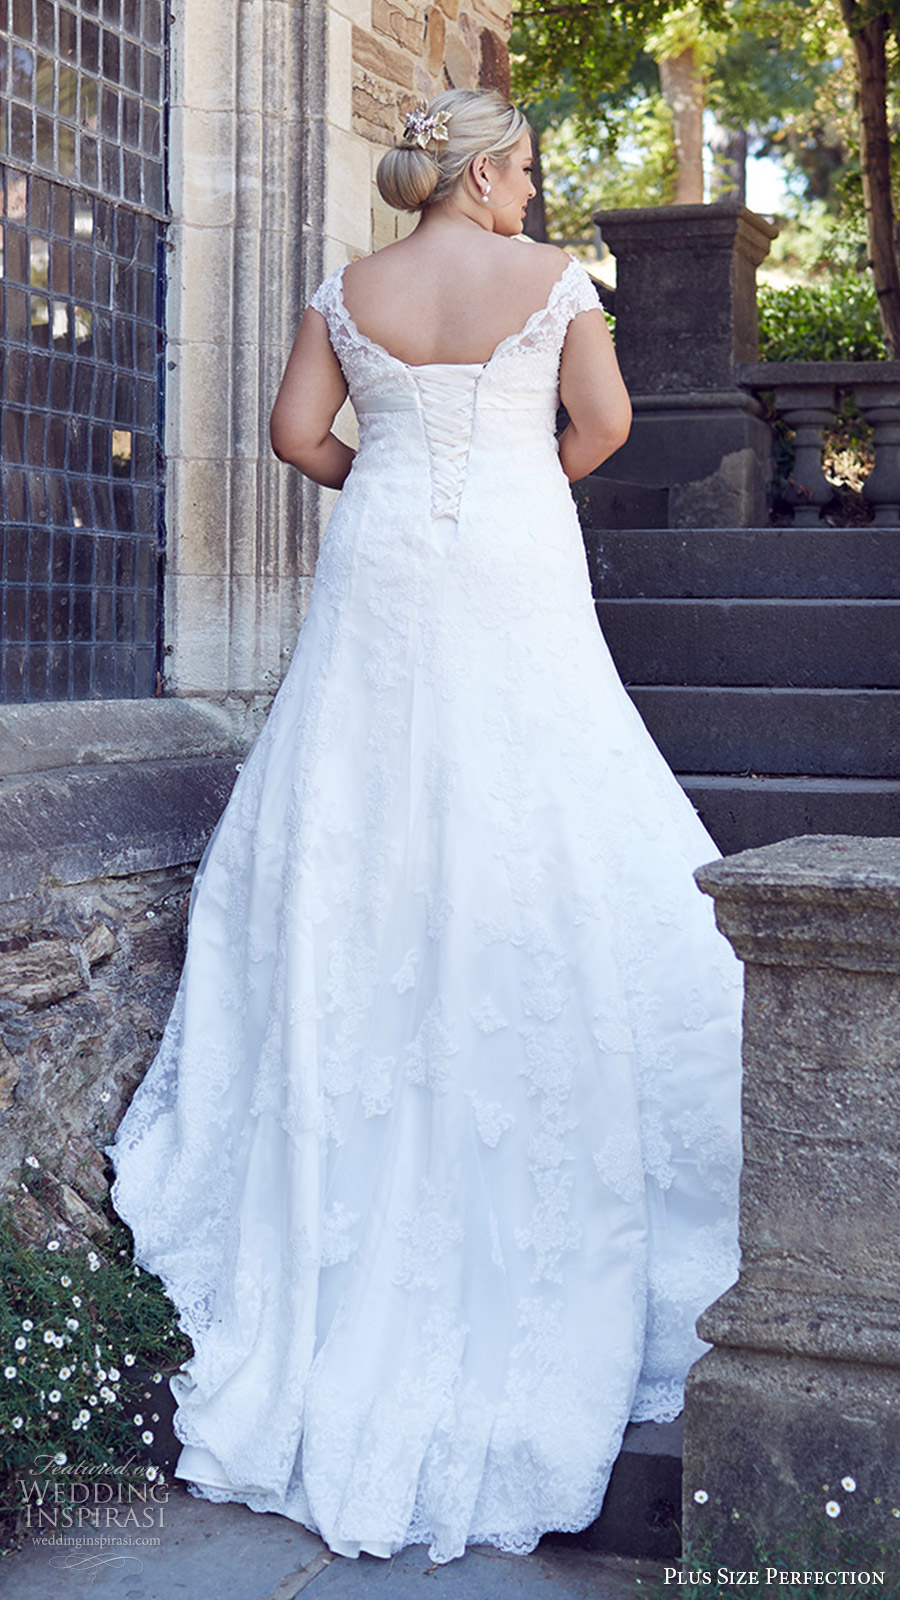 plus size perfection bridal 2016 cap sleeve off shoulder trumpet lace wedding dress (bridget) bv corset back train romantic elegant